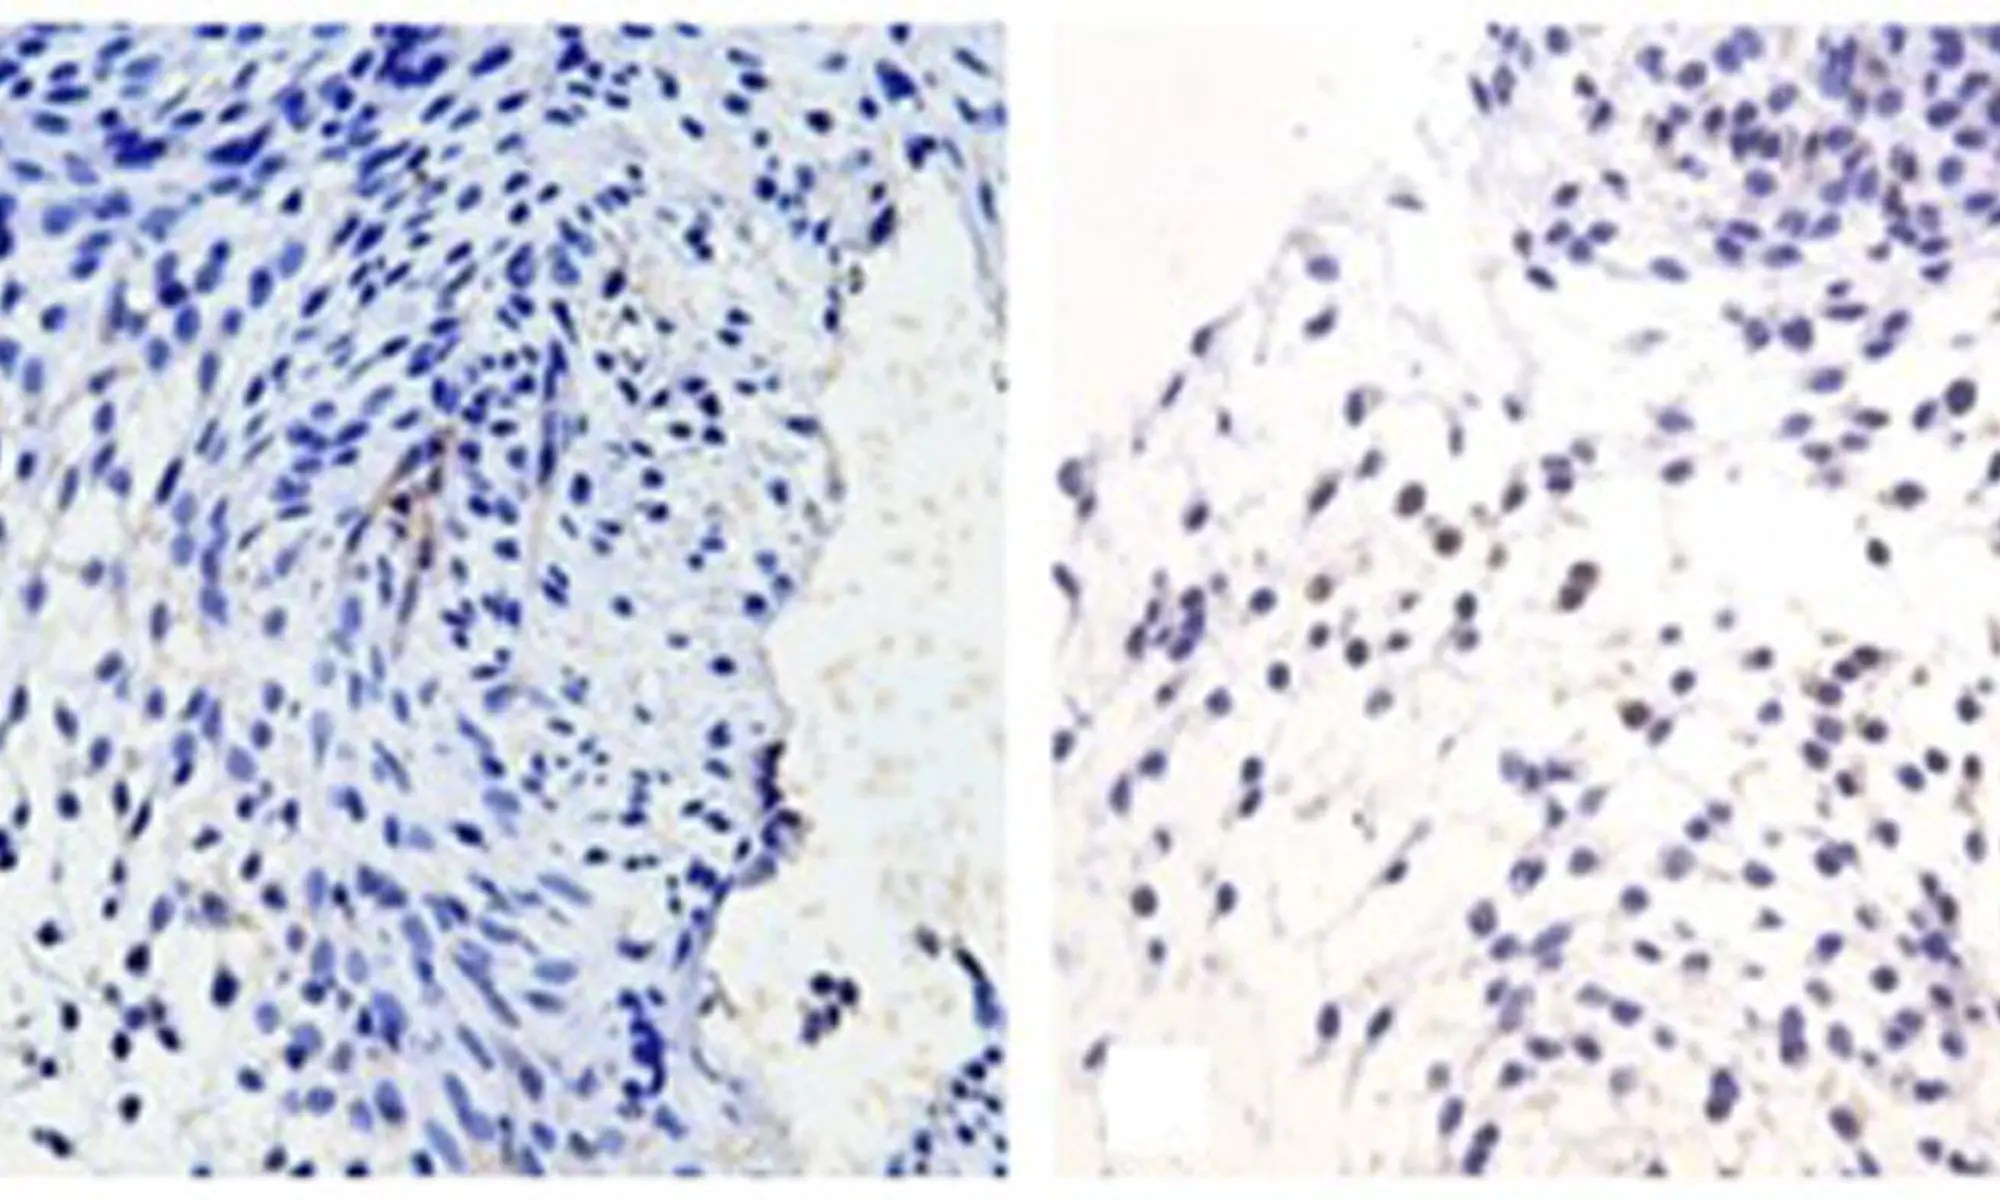 image of Expression of GPER in mouse gubernaculums testis